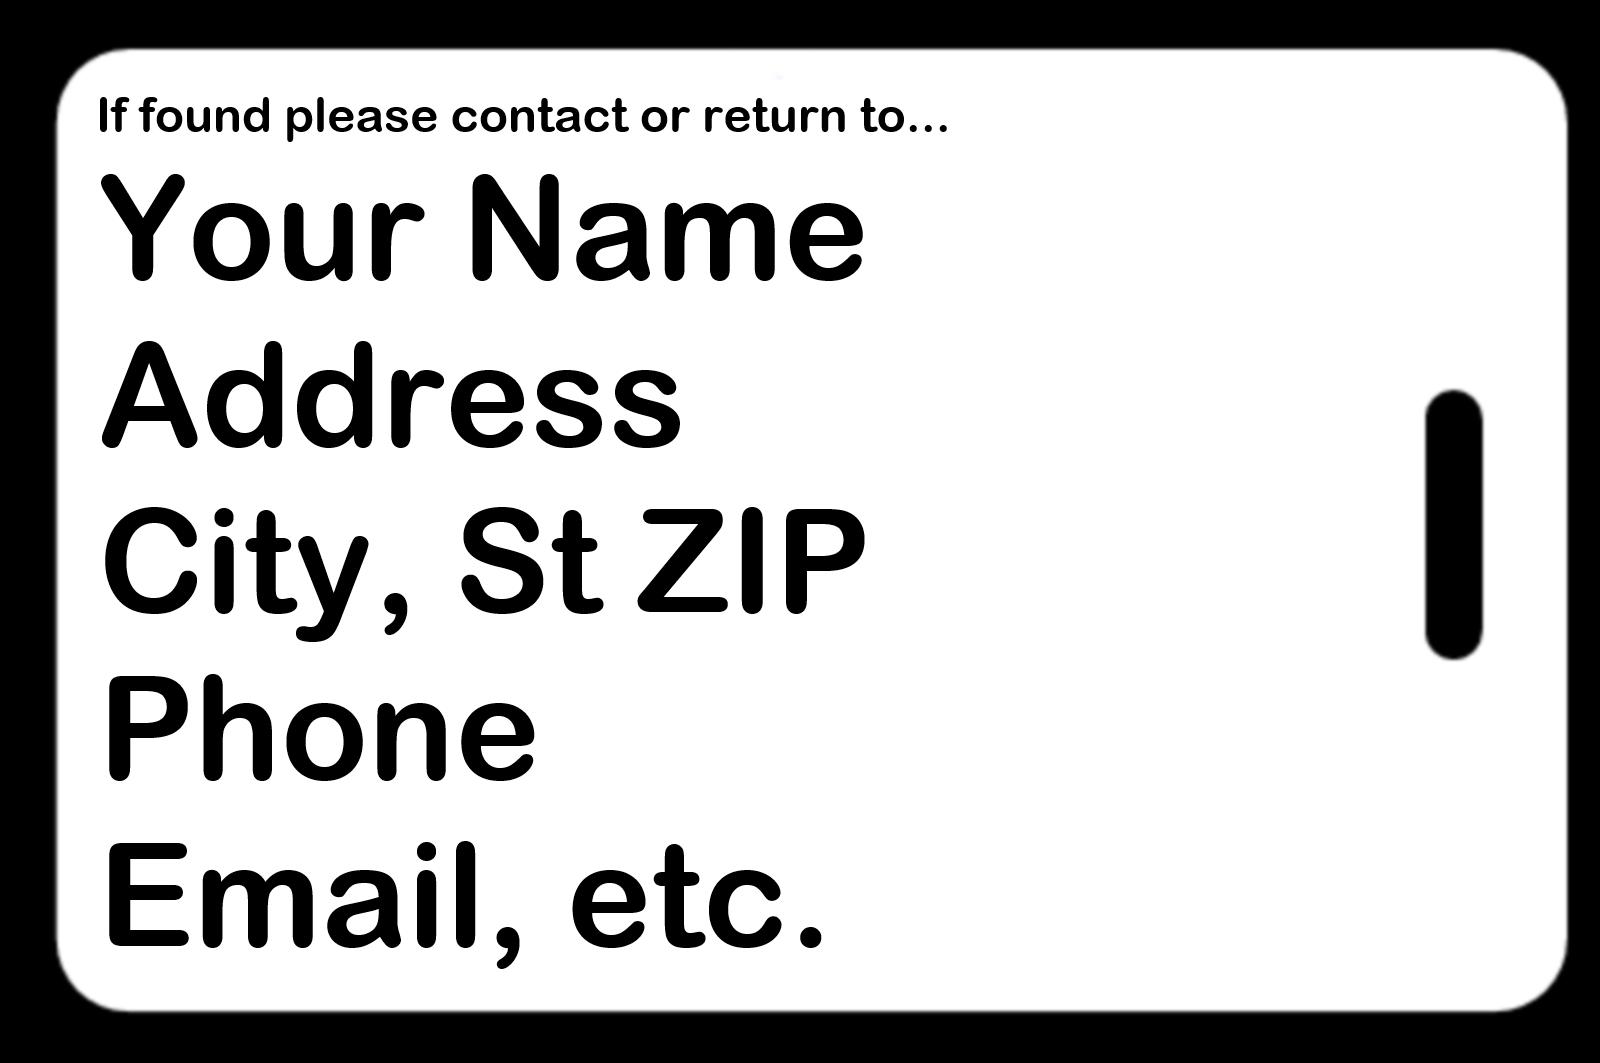 FREE Personalization on back!